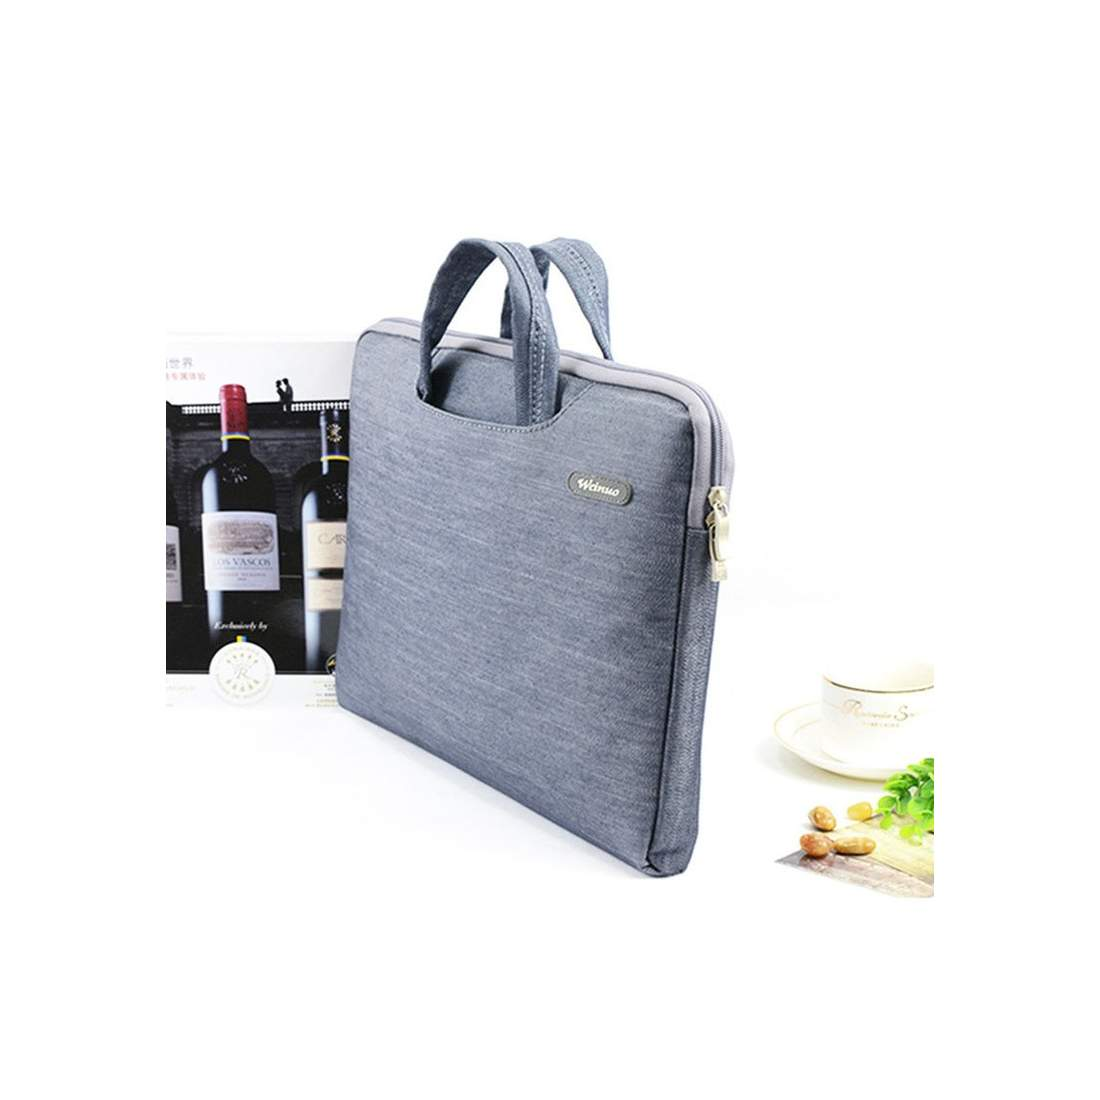 Laptop Väska Ica